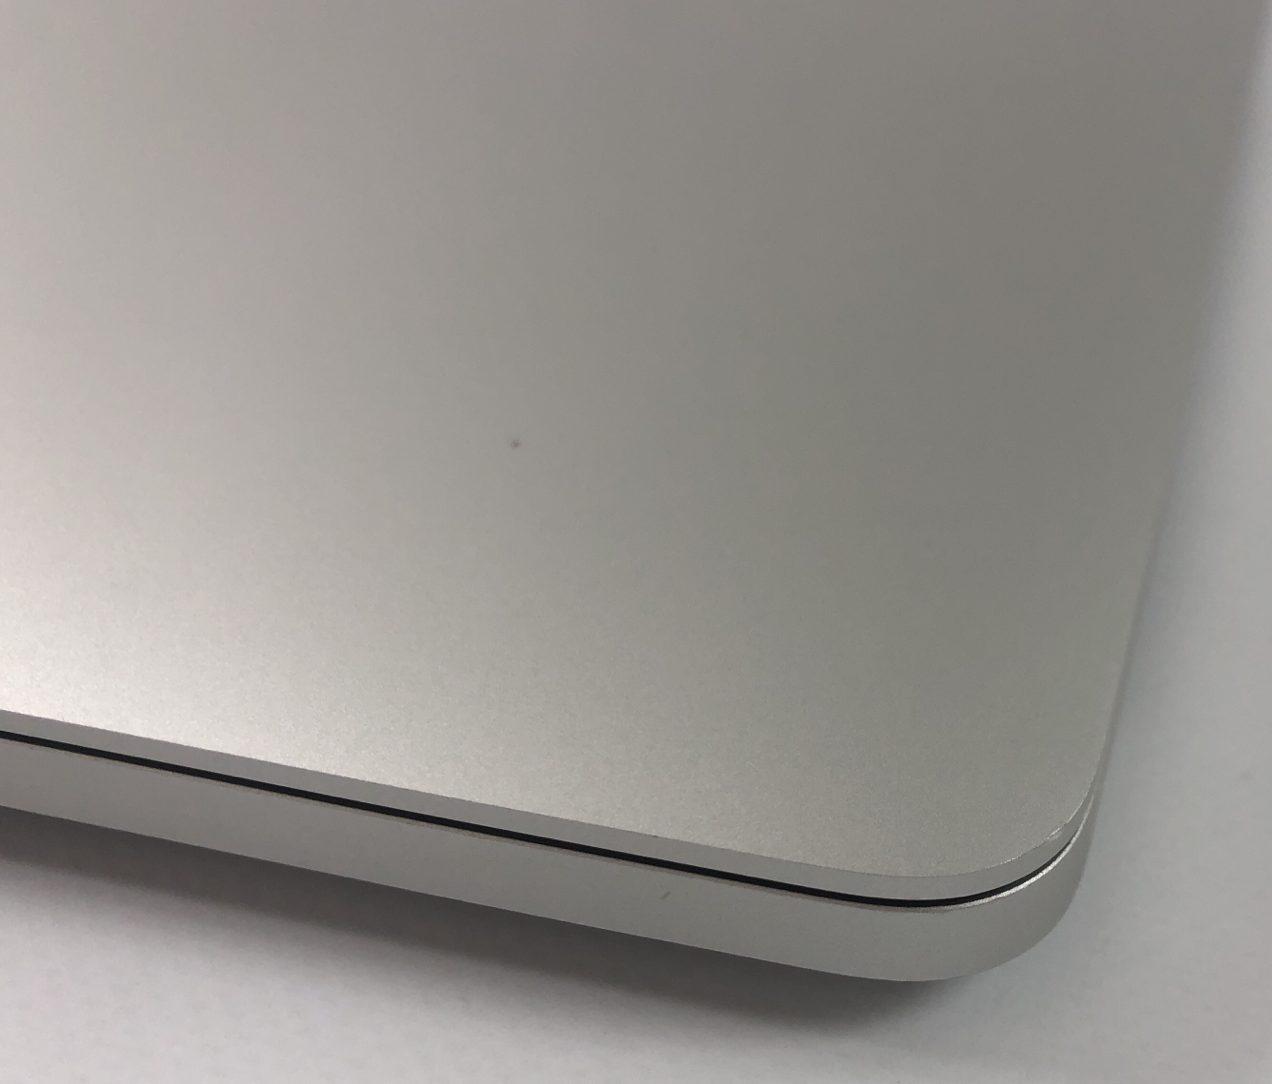 "MacBook Pro 13"" 4TBT Late 2016 (Intel Core i5 2.9 GHz 8 GB RAM 512 GB SSD), Silver, Intel Core i5 2.9 GHz, 8 GB RAM, 512 GB SSD, Kuva 3"